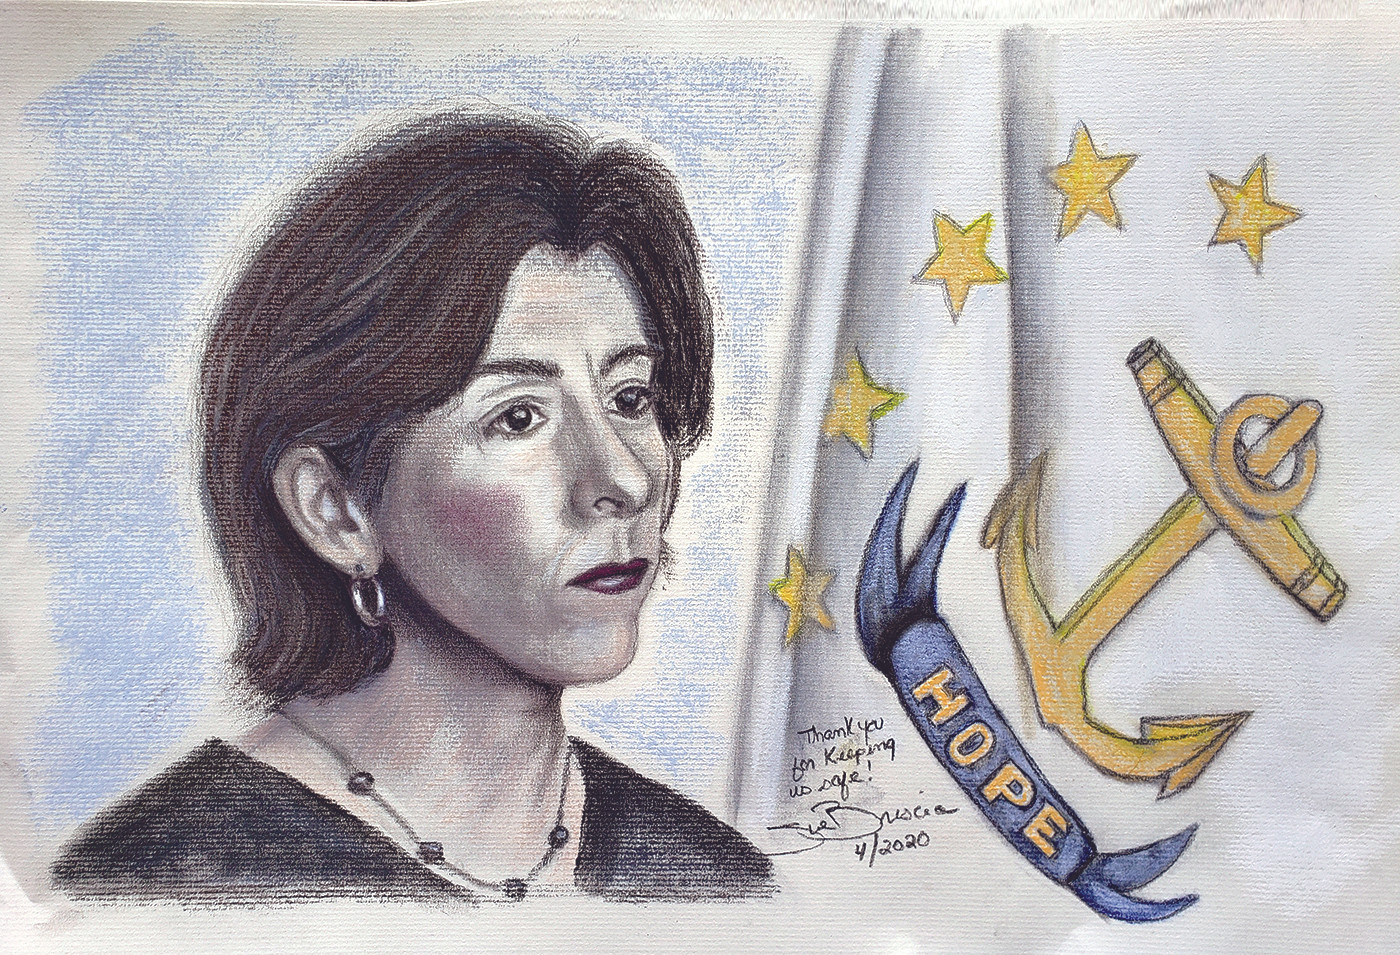 Charcoal of Gov. Gina Raimondo